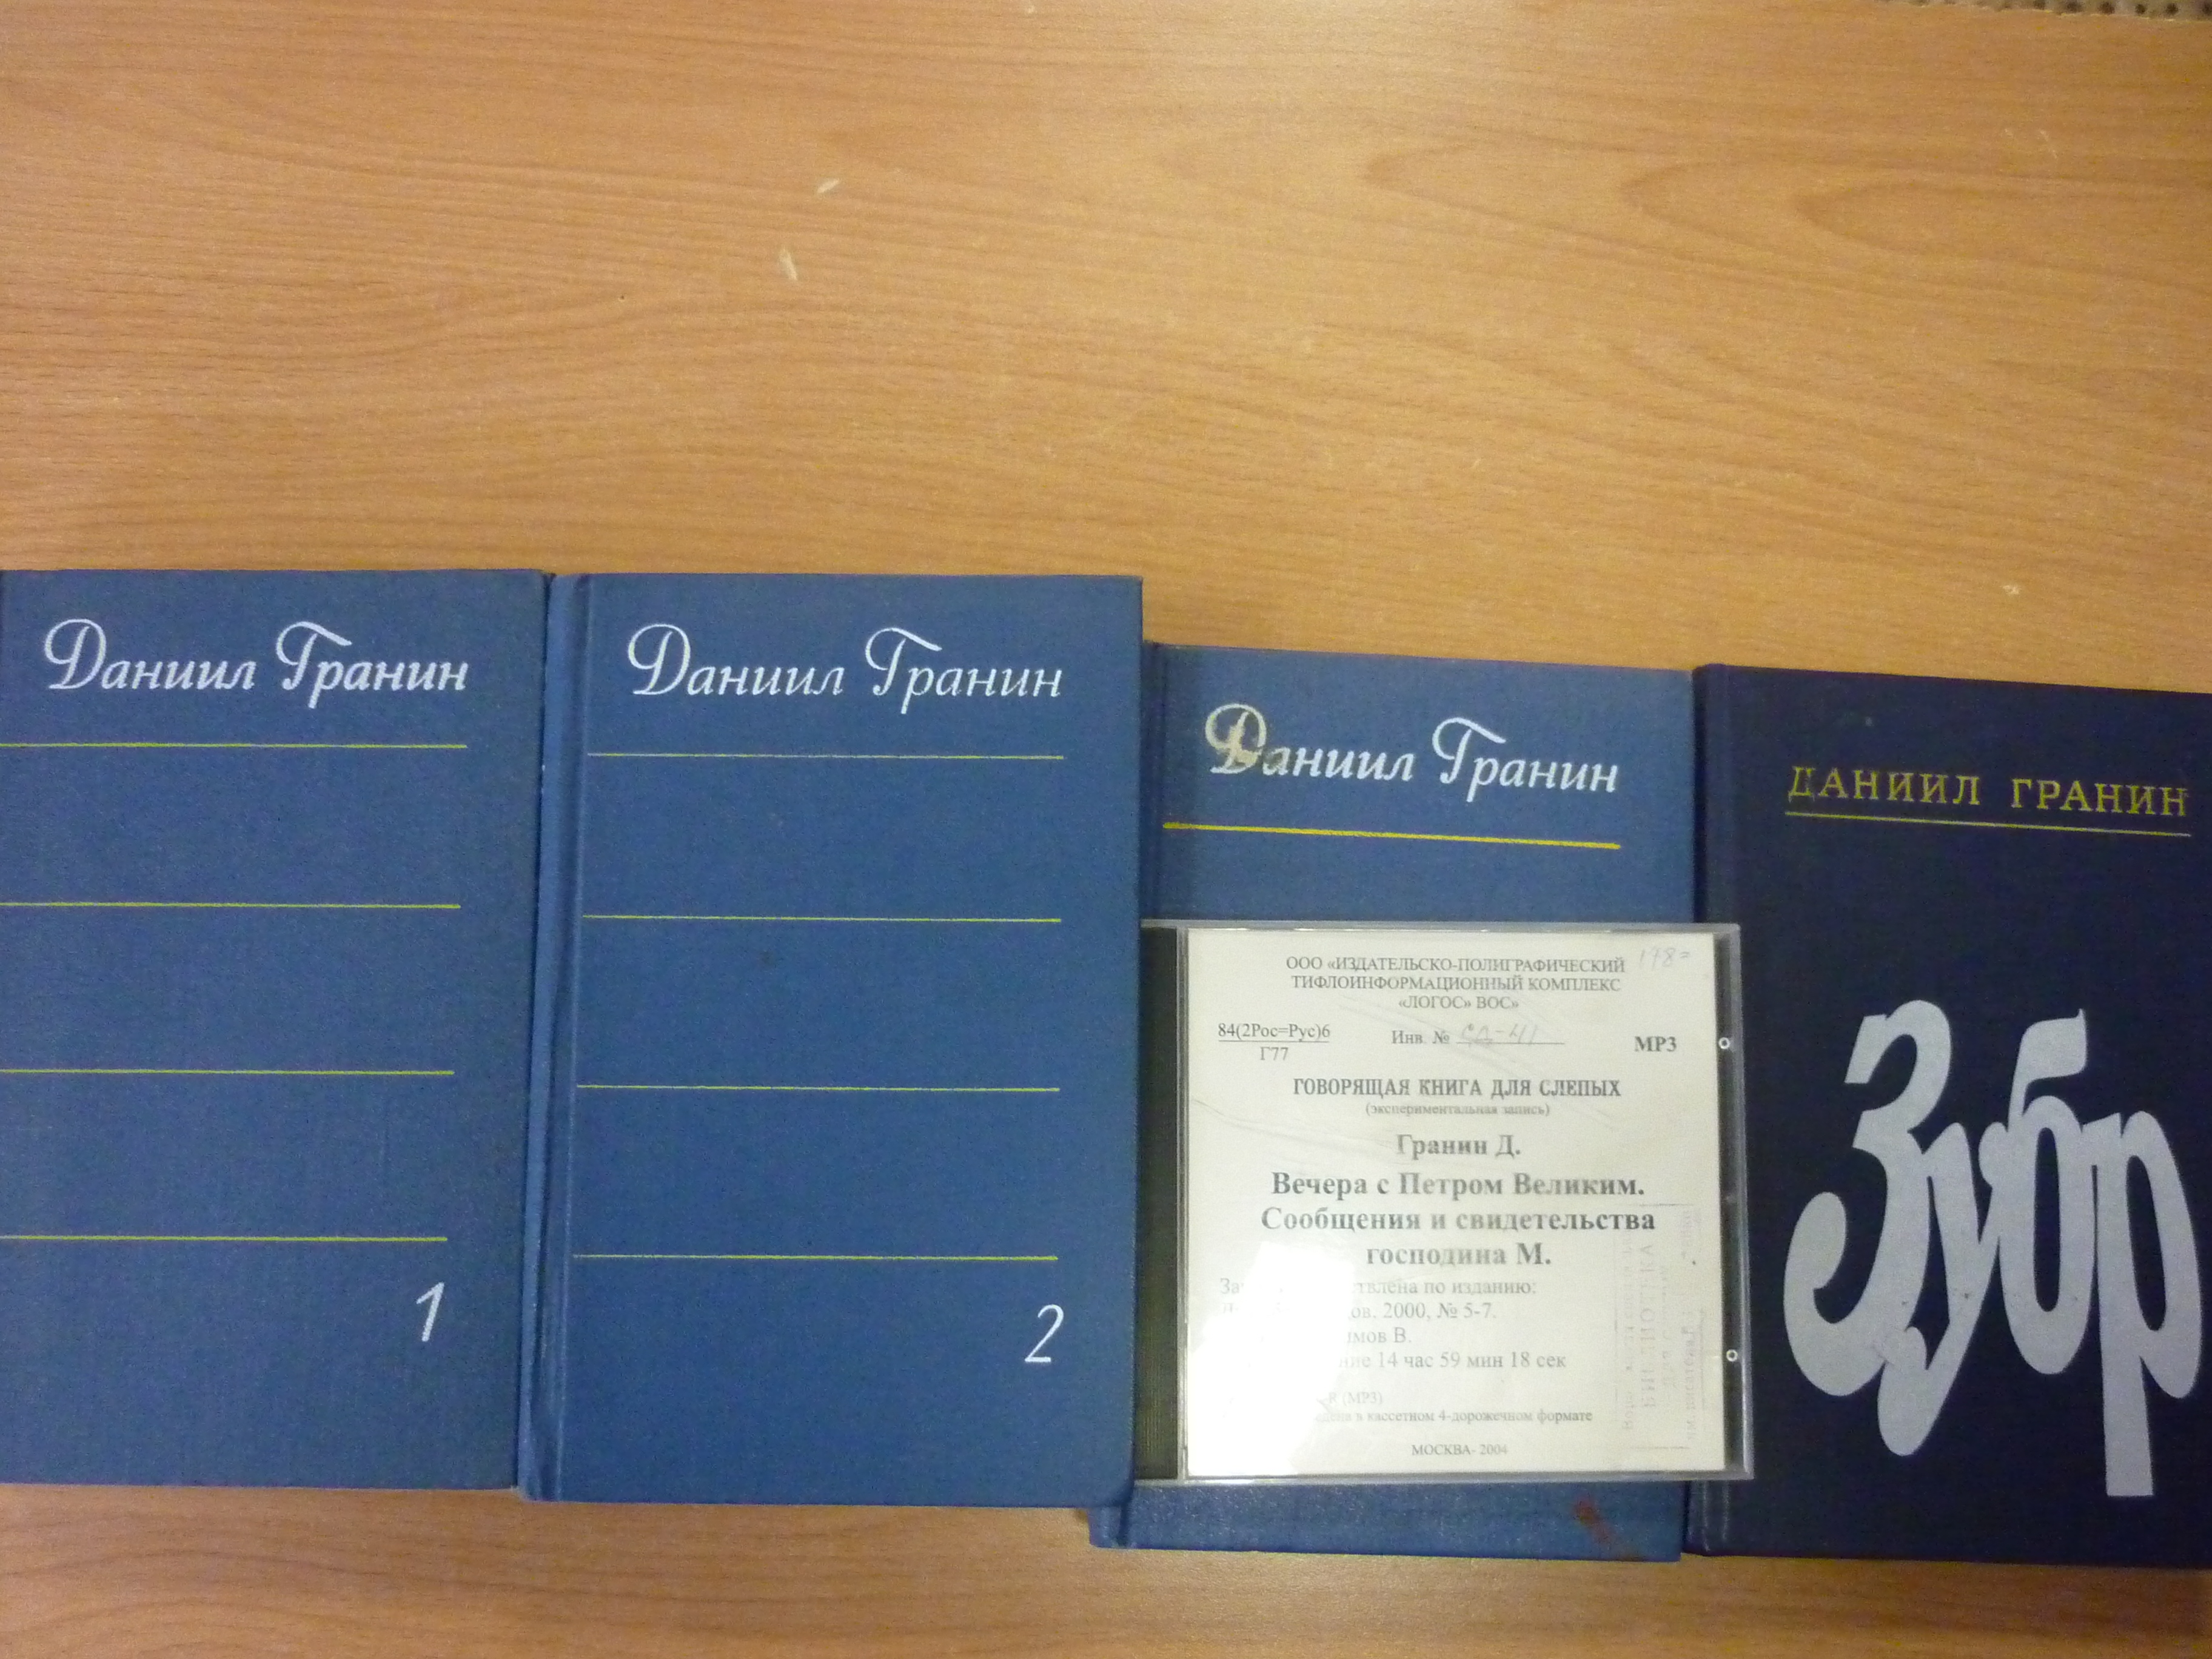 Даниилу Гранину – 100 лет